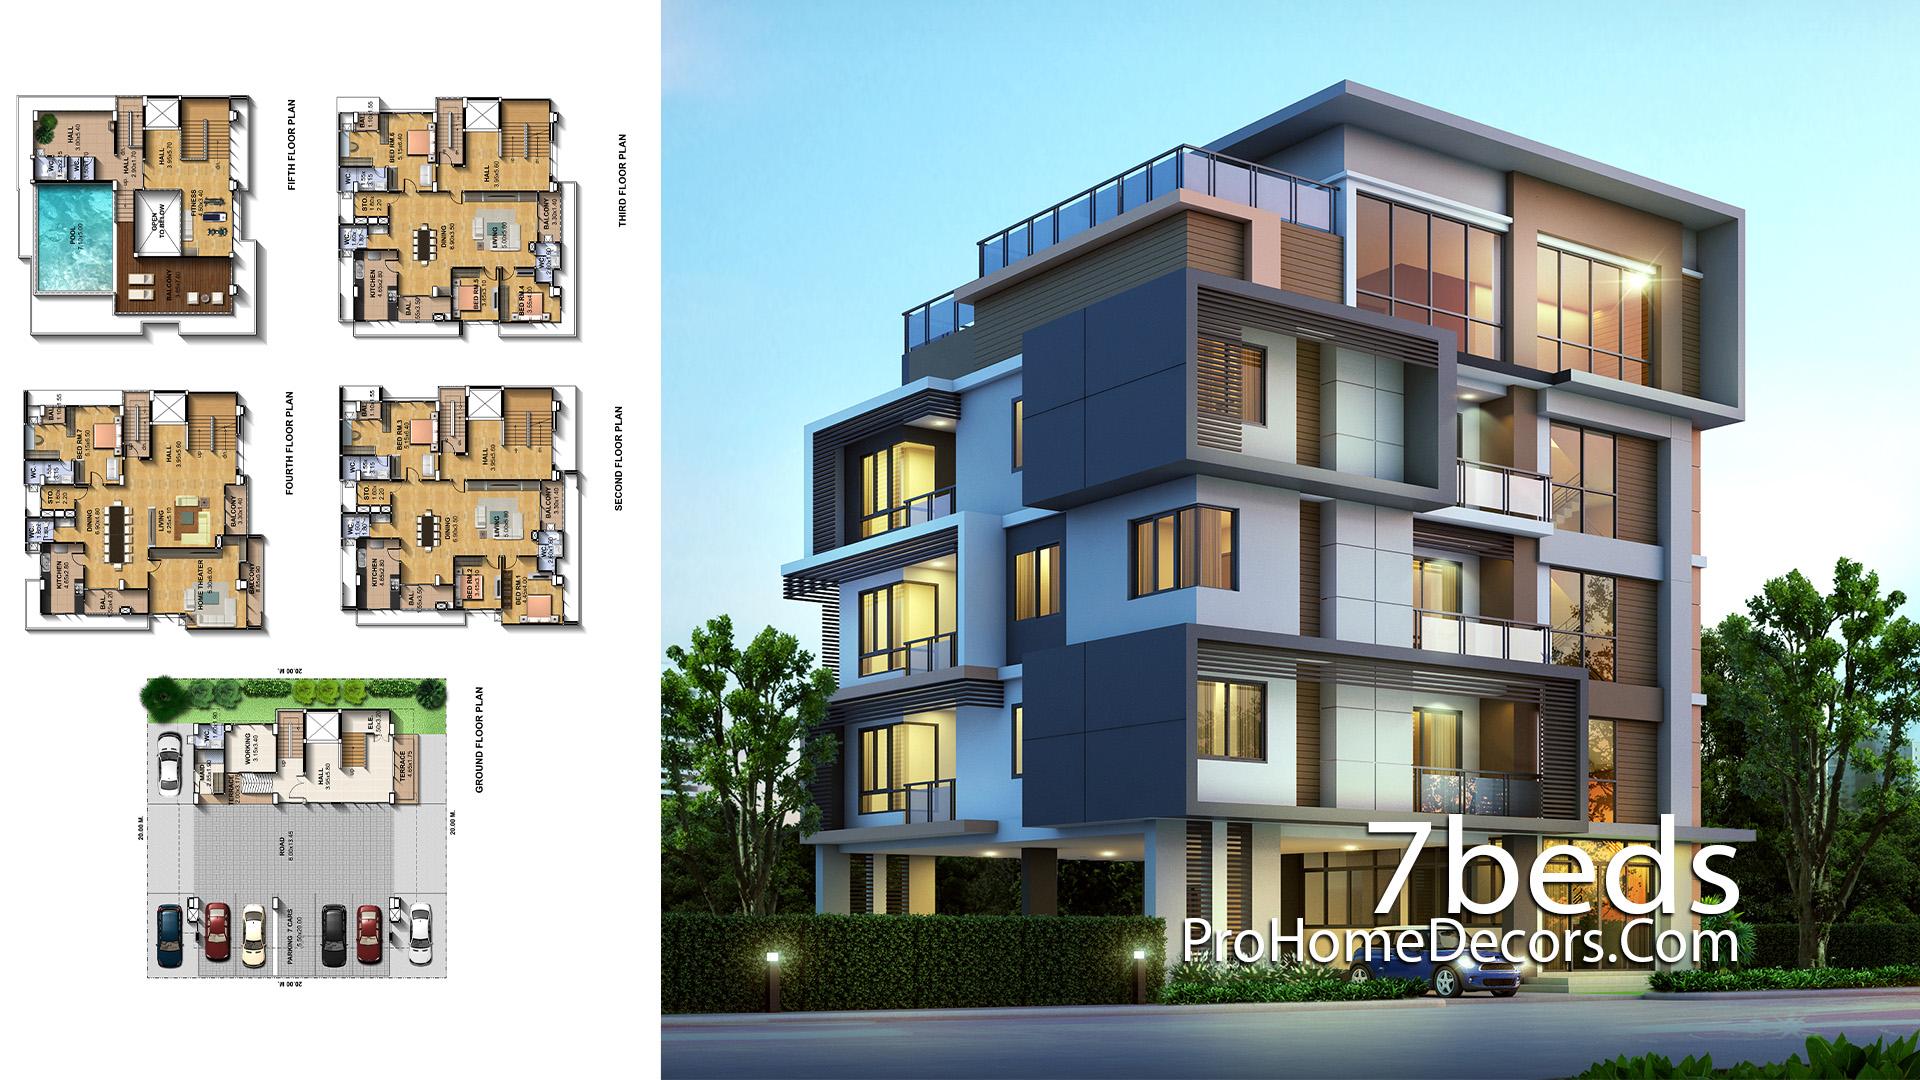 Exclusive House Plot 20x20 Meter with 7 Bedrooms